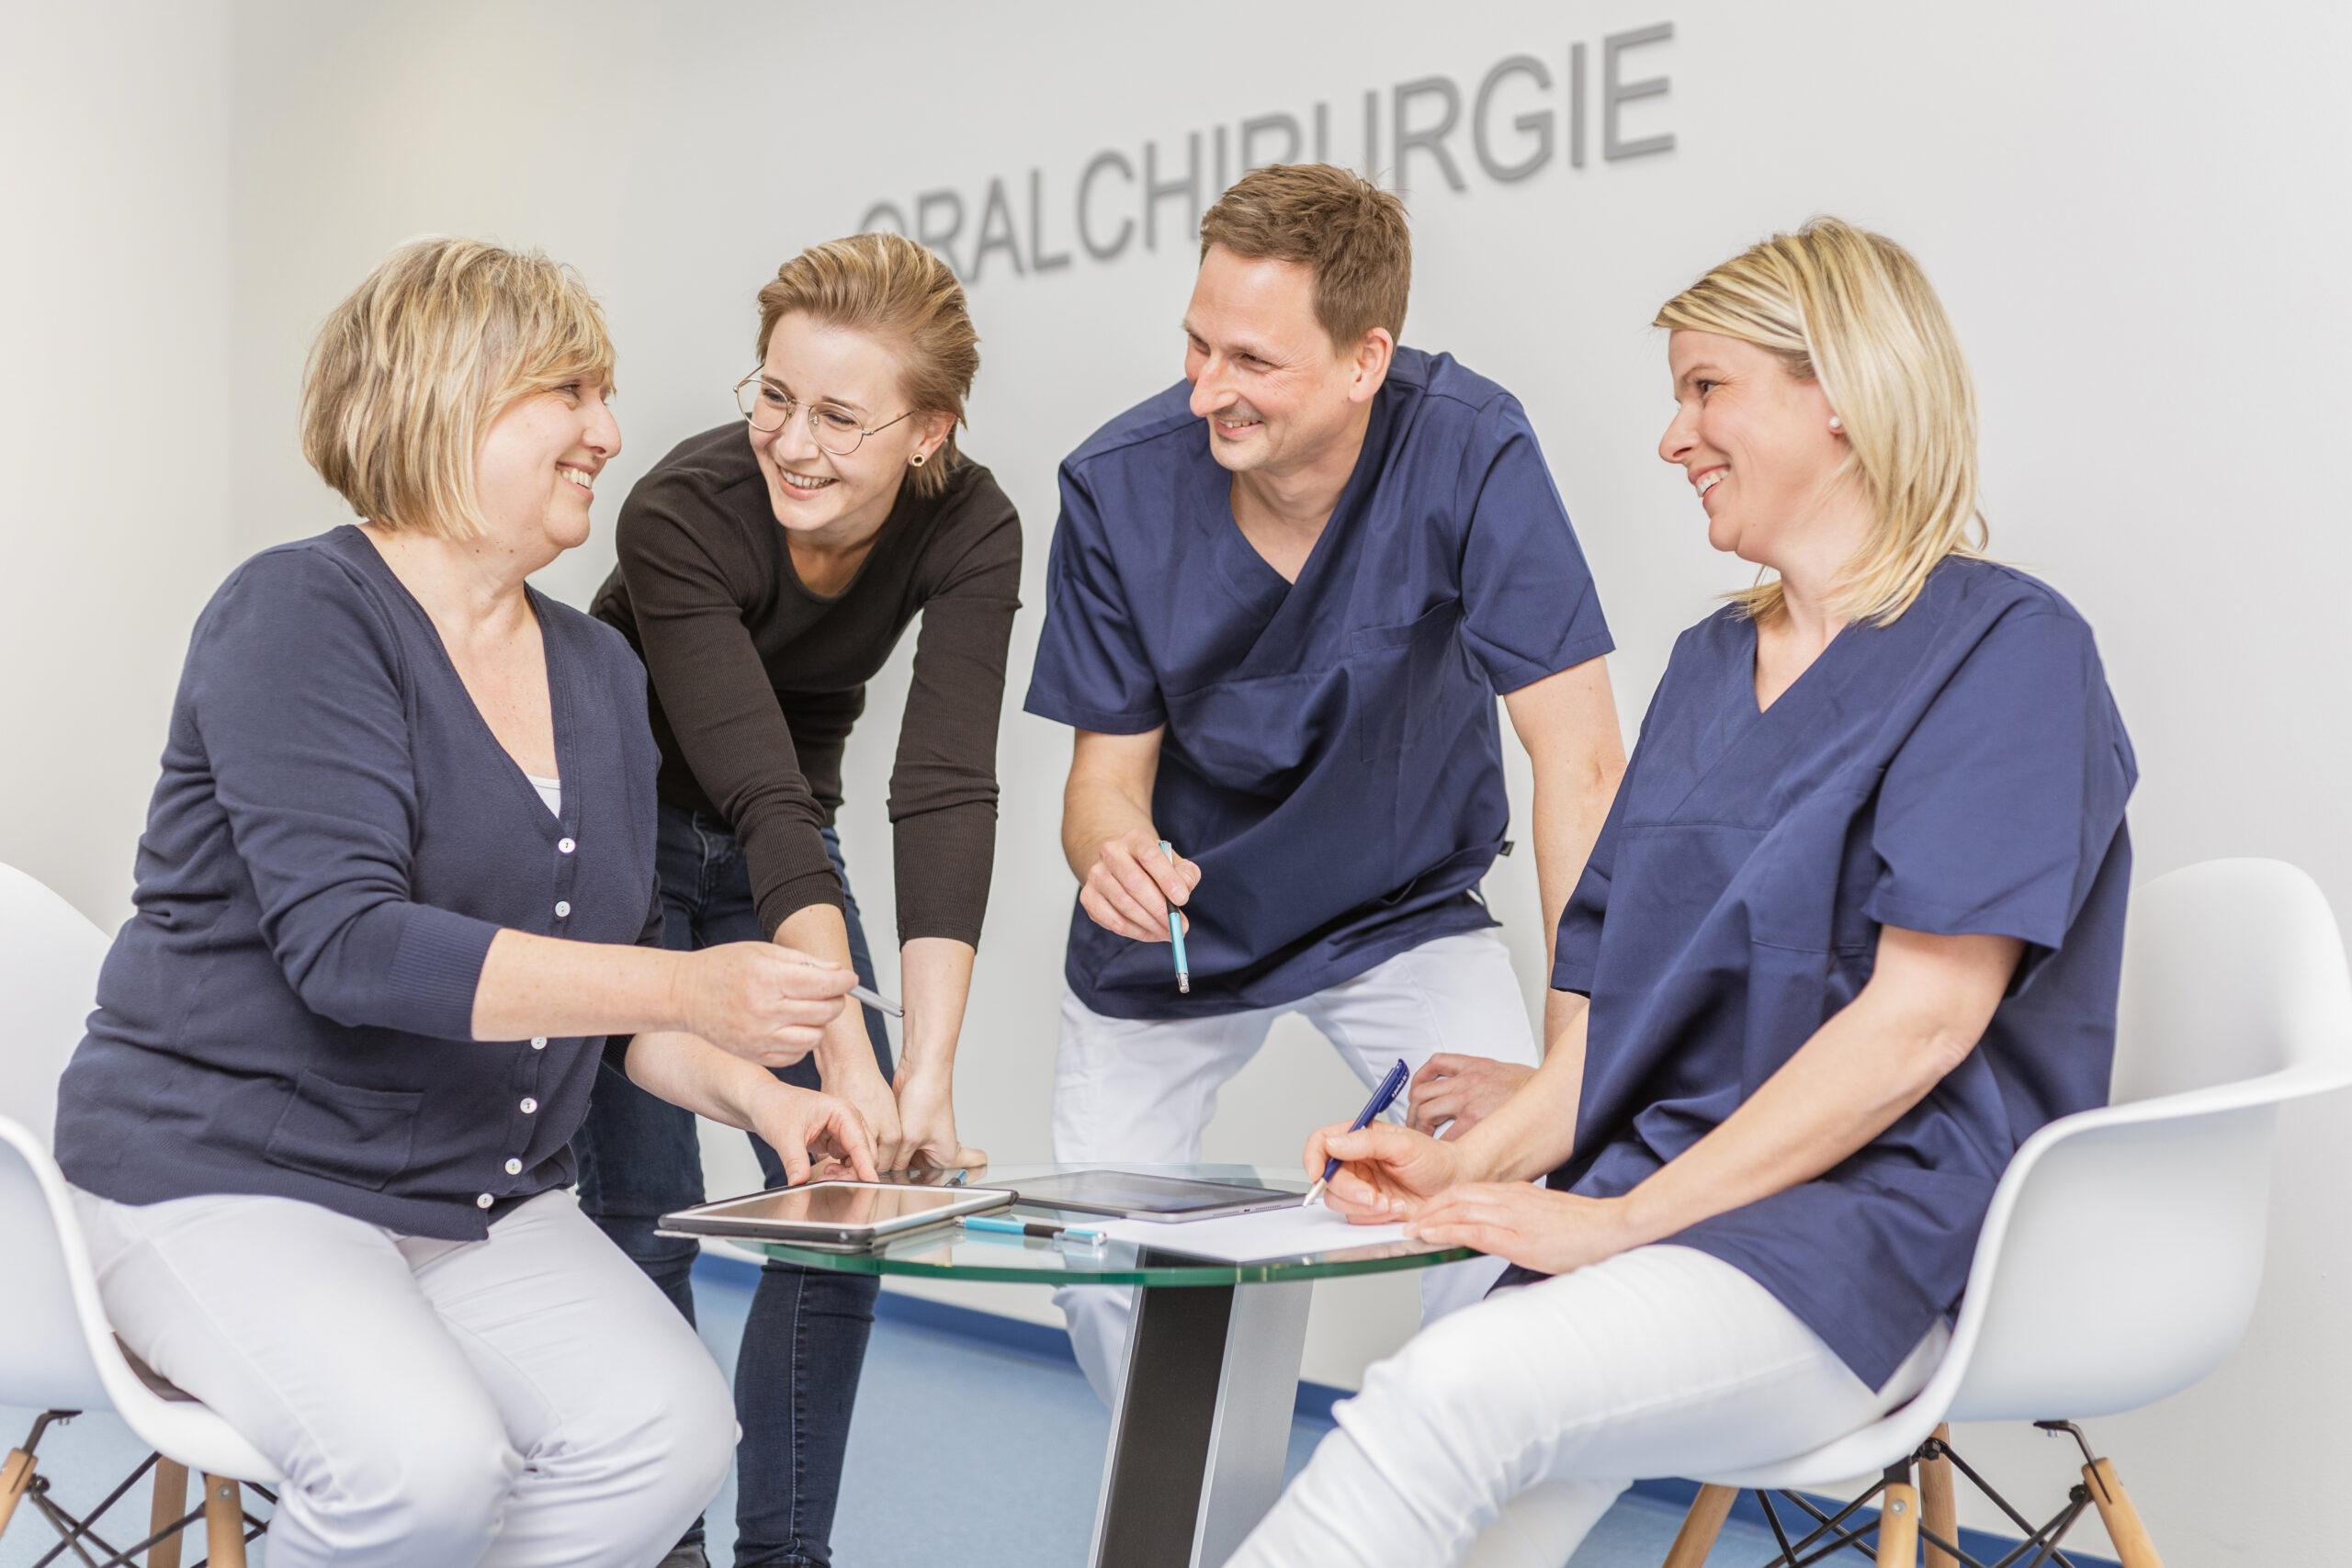 Dr. Bertram Team by Markus Heisler